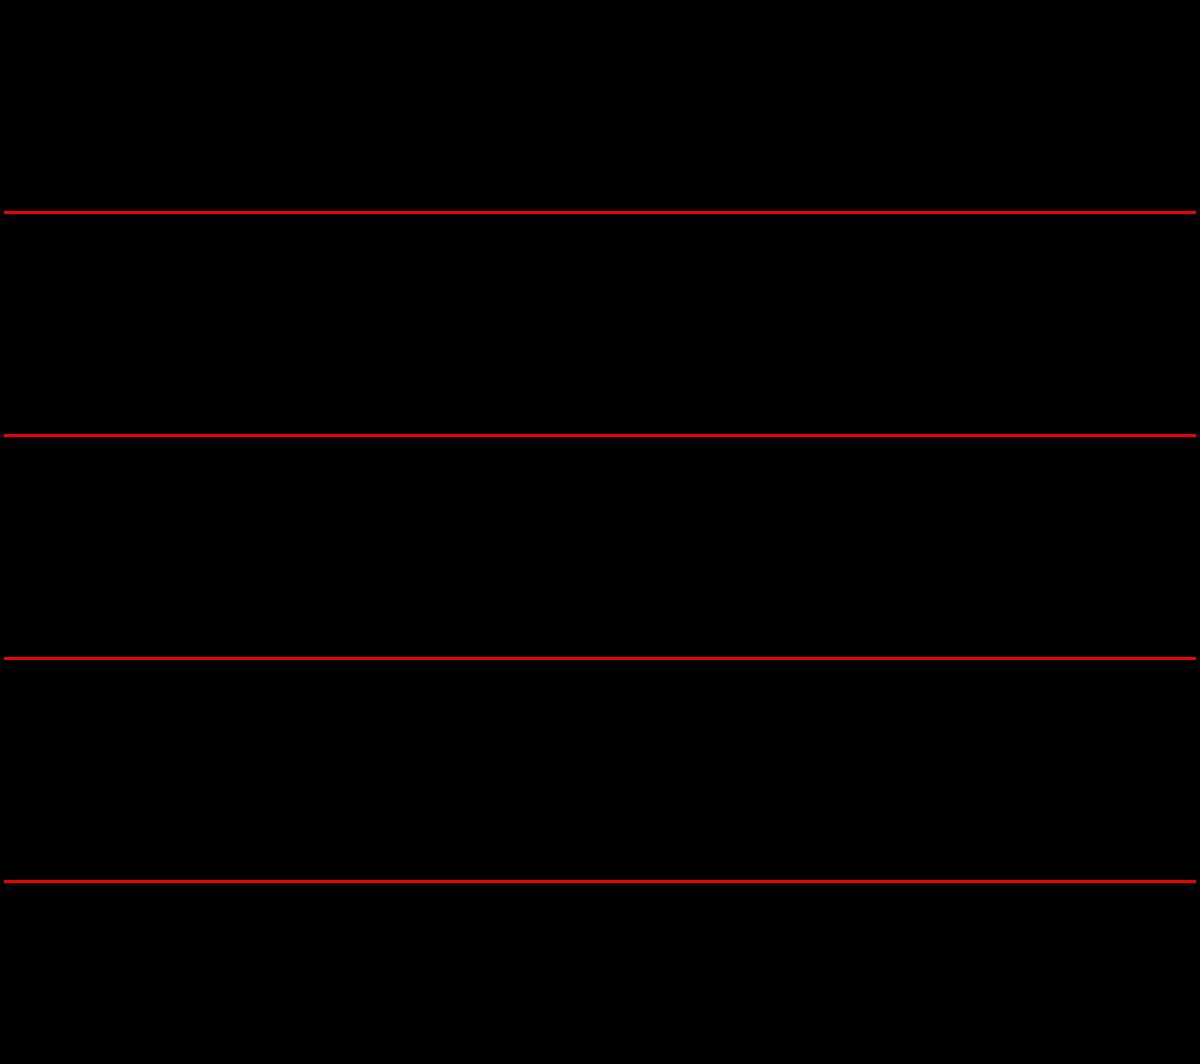 Star Wars Aurek Besh Alphabet Chart Languages In Origami Diagrams And Crease Patterns Starwarigami Wikipedia